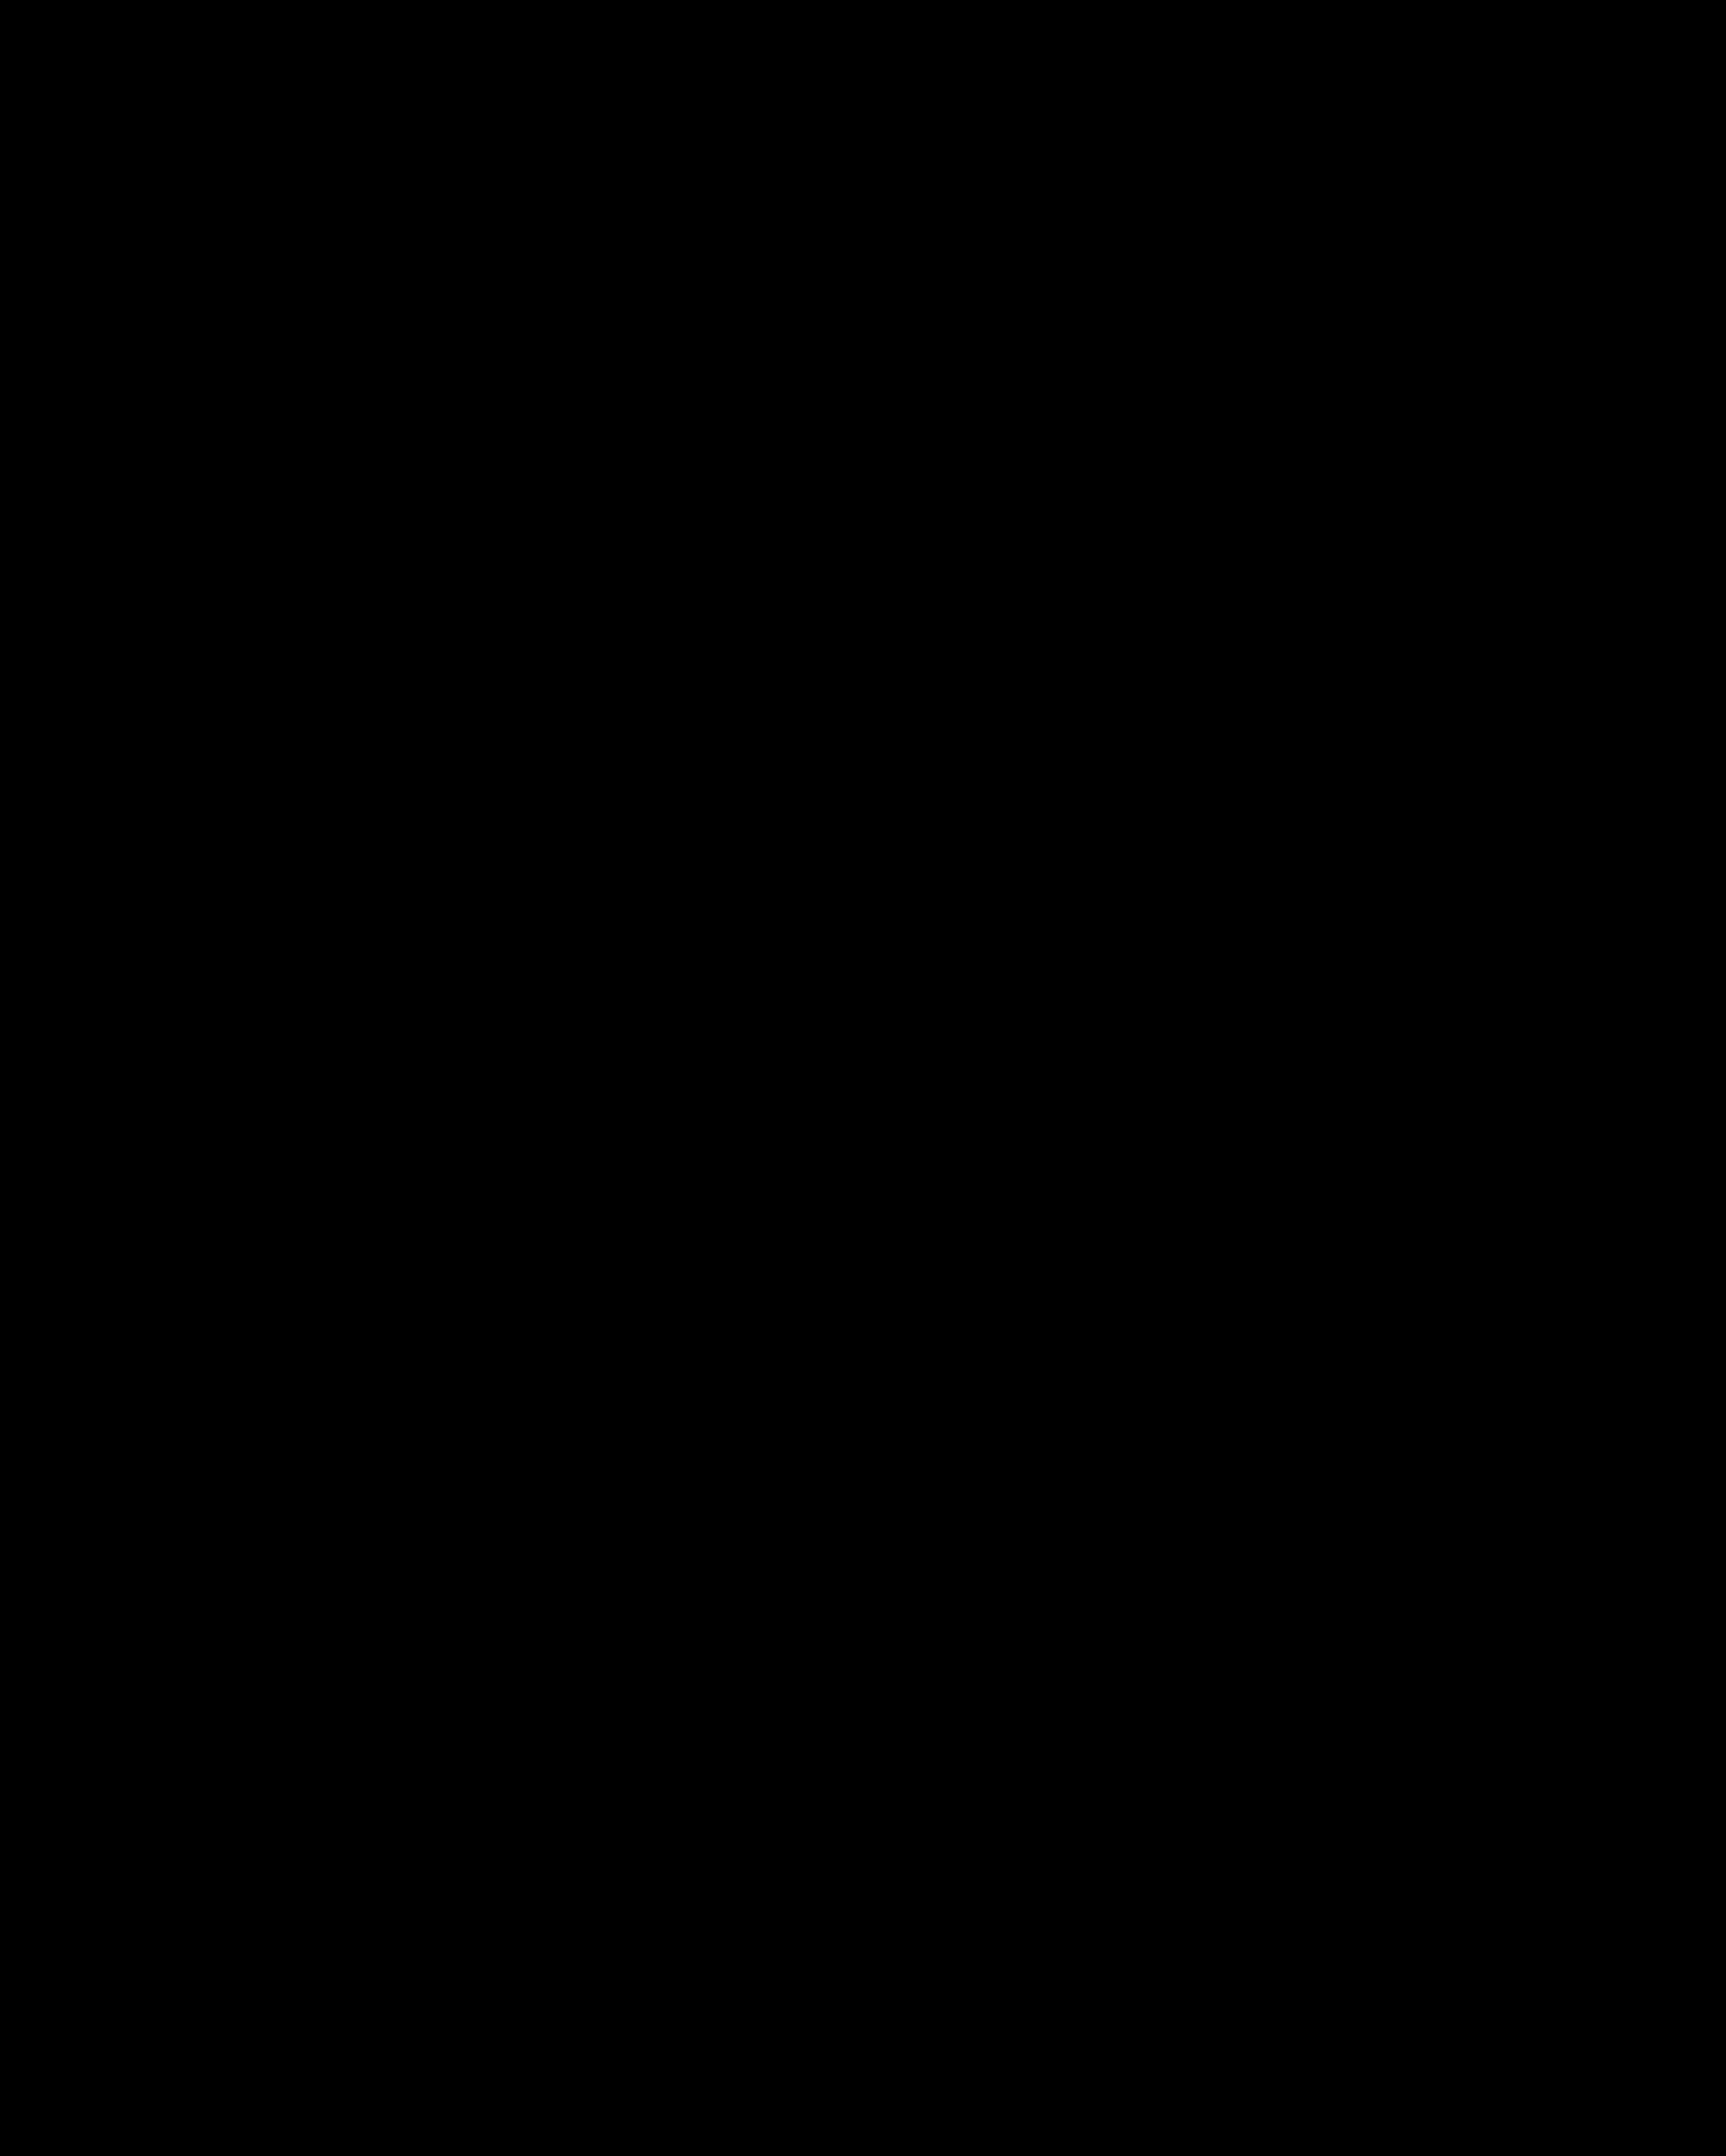 1920x2399 Clipart